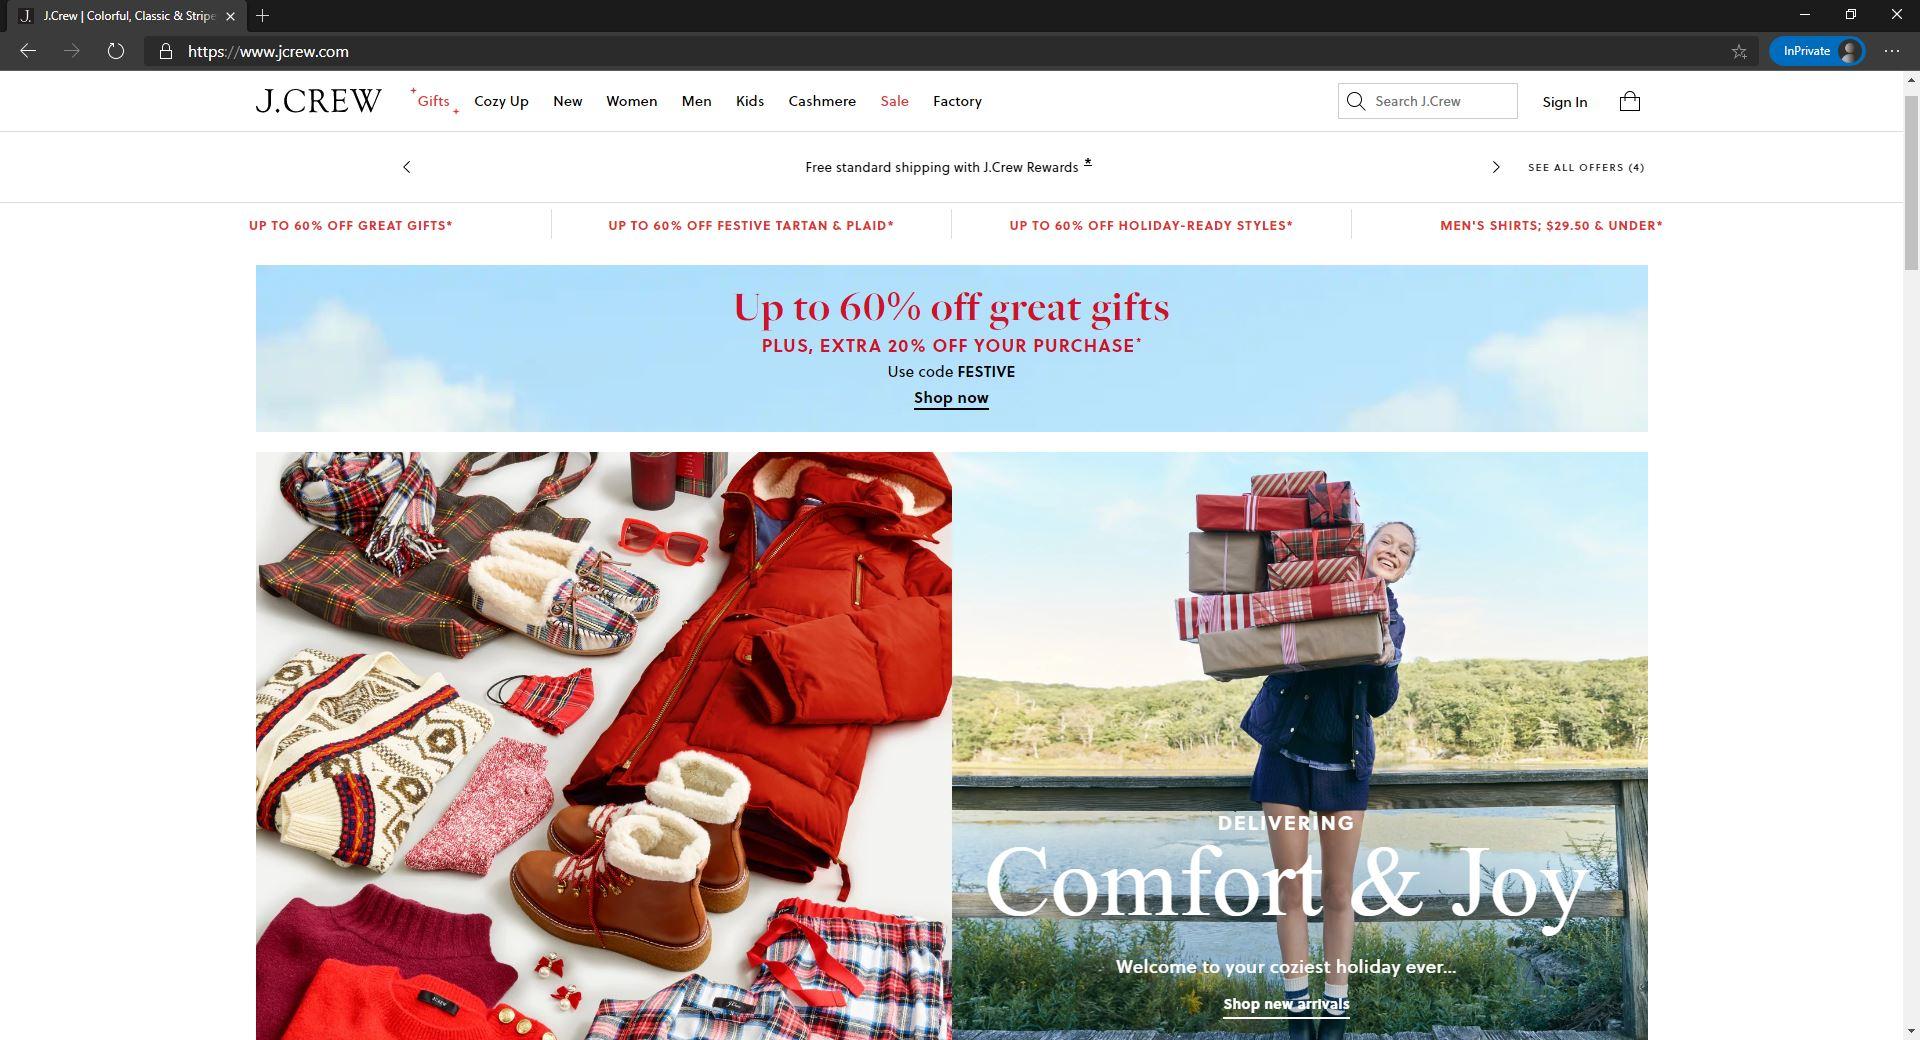 JCrew website hompage